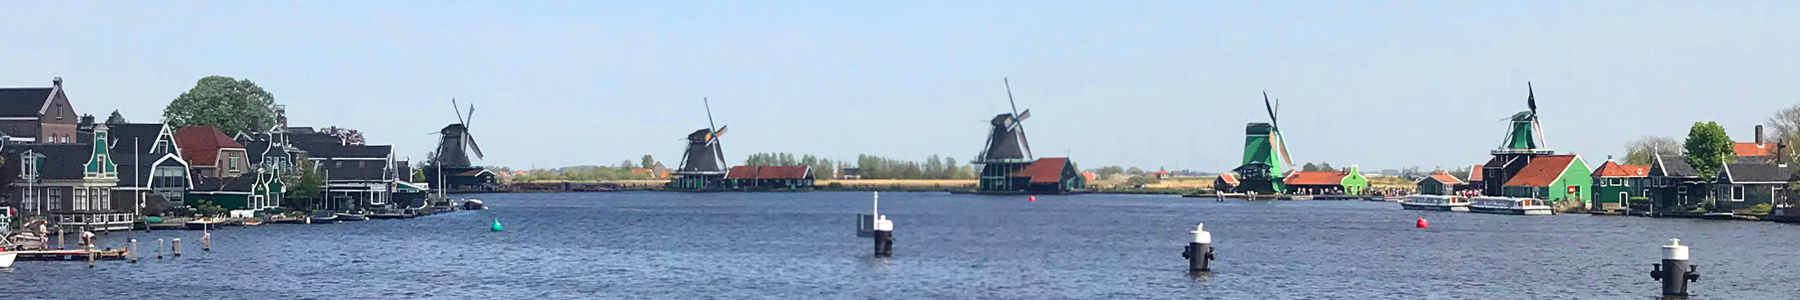 Netherlands Food Stores & Restaurant Delivery | ExpatINFO Holland